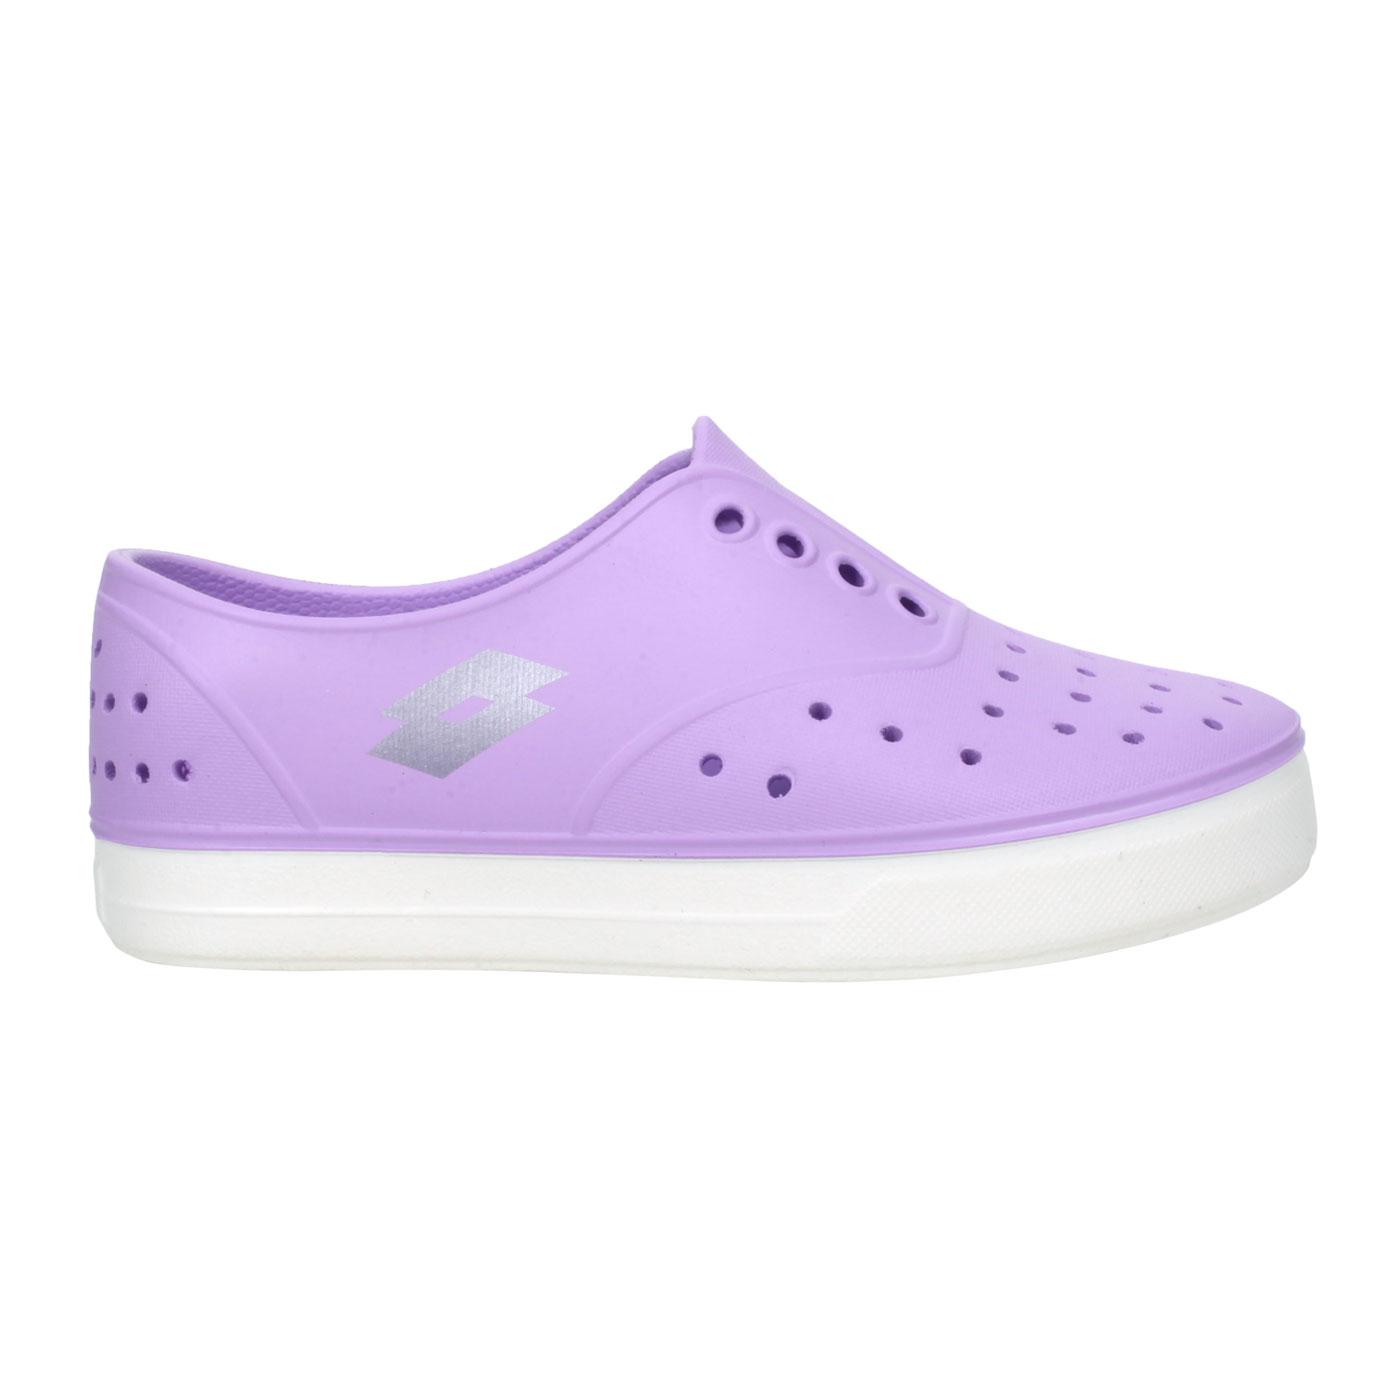 LOTTO 中童繽紛玩色亮彩洞洞鞋 LT1AKS3537 - 紫